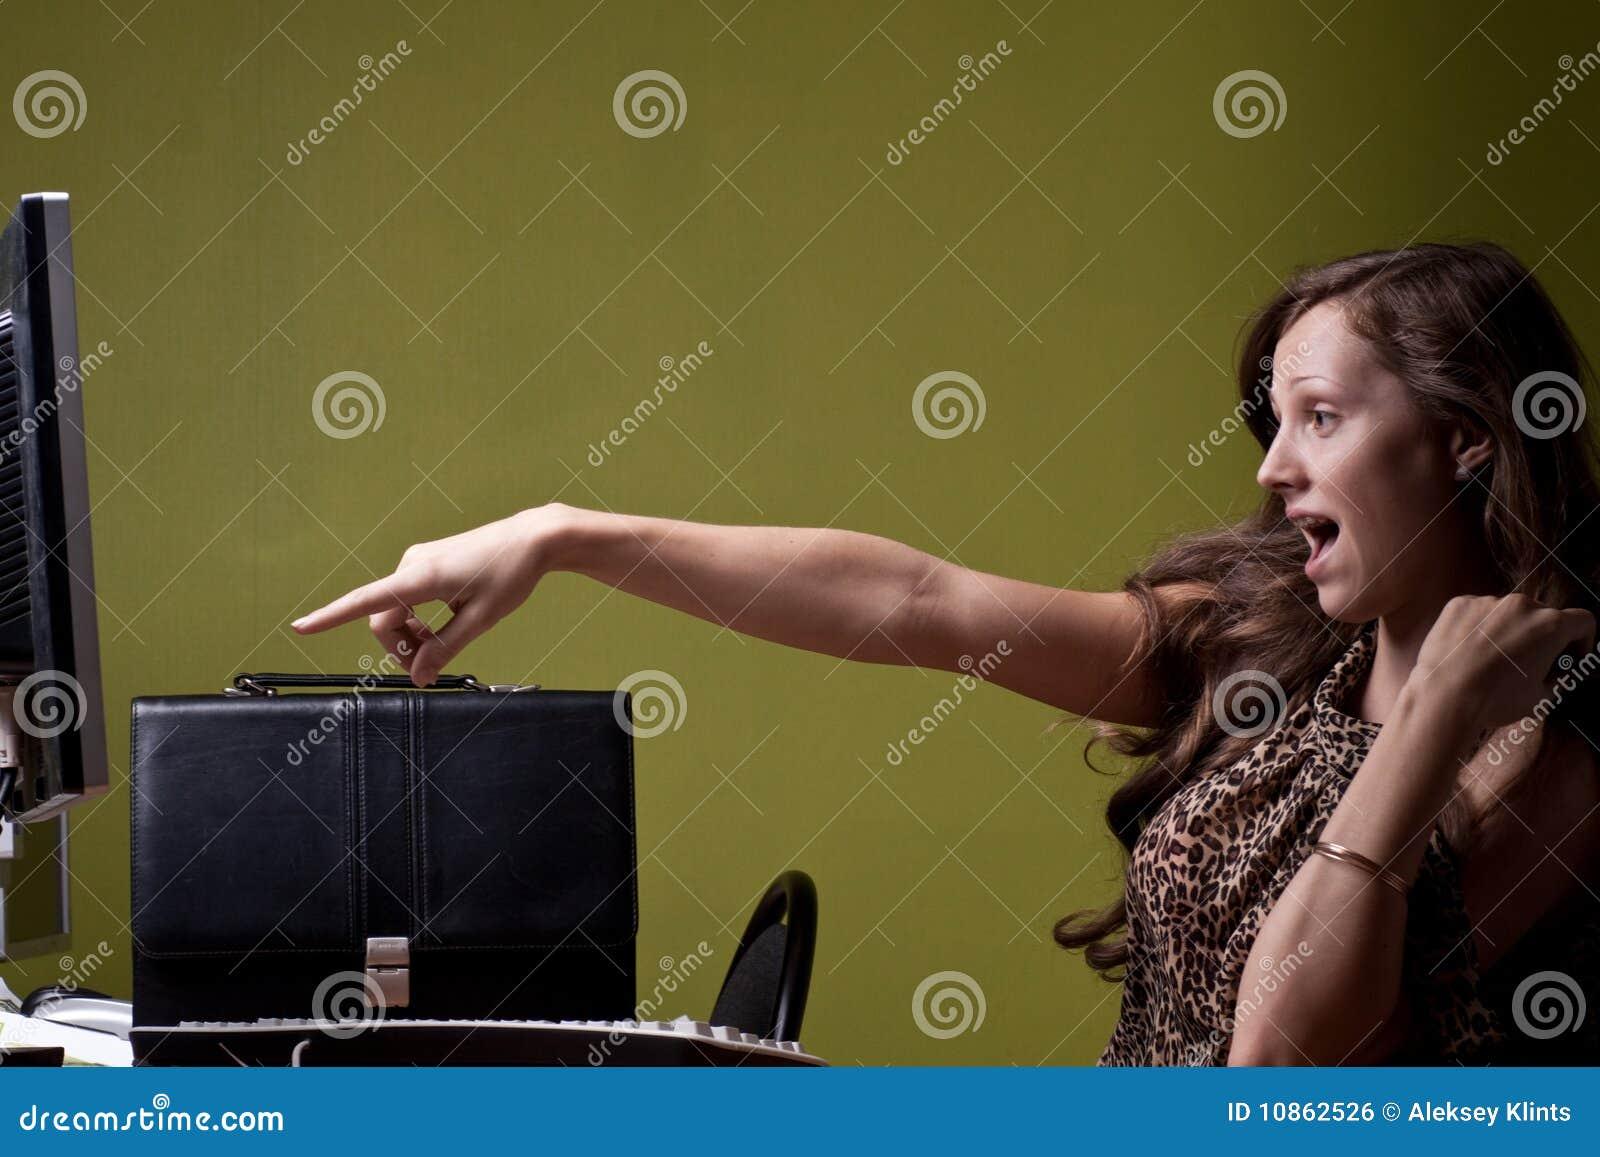 secretary screaming